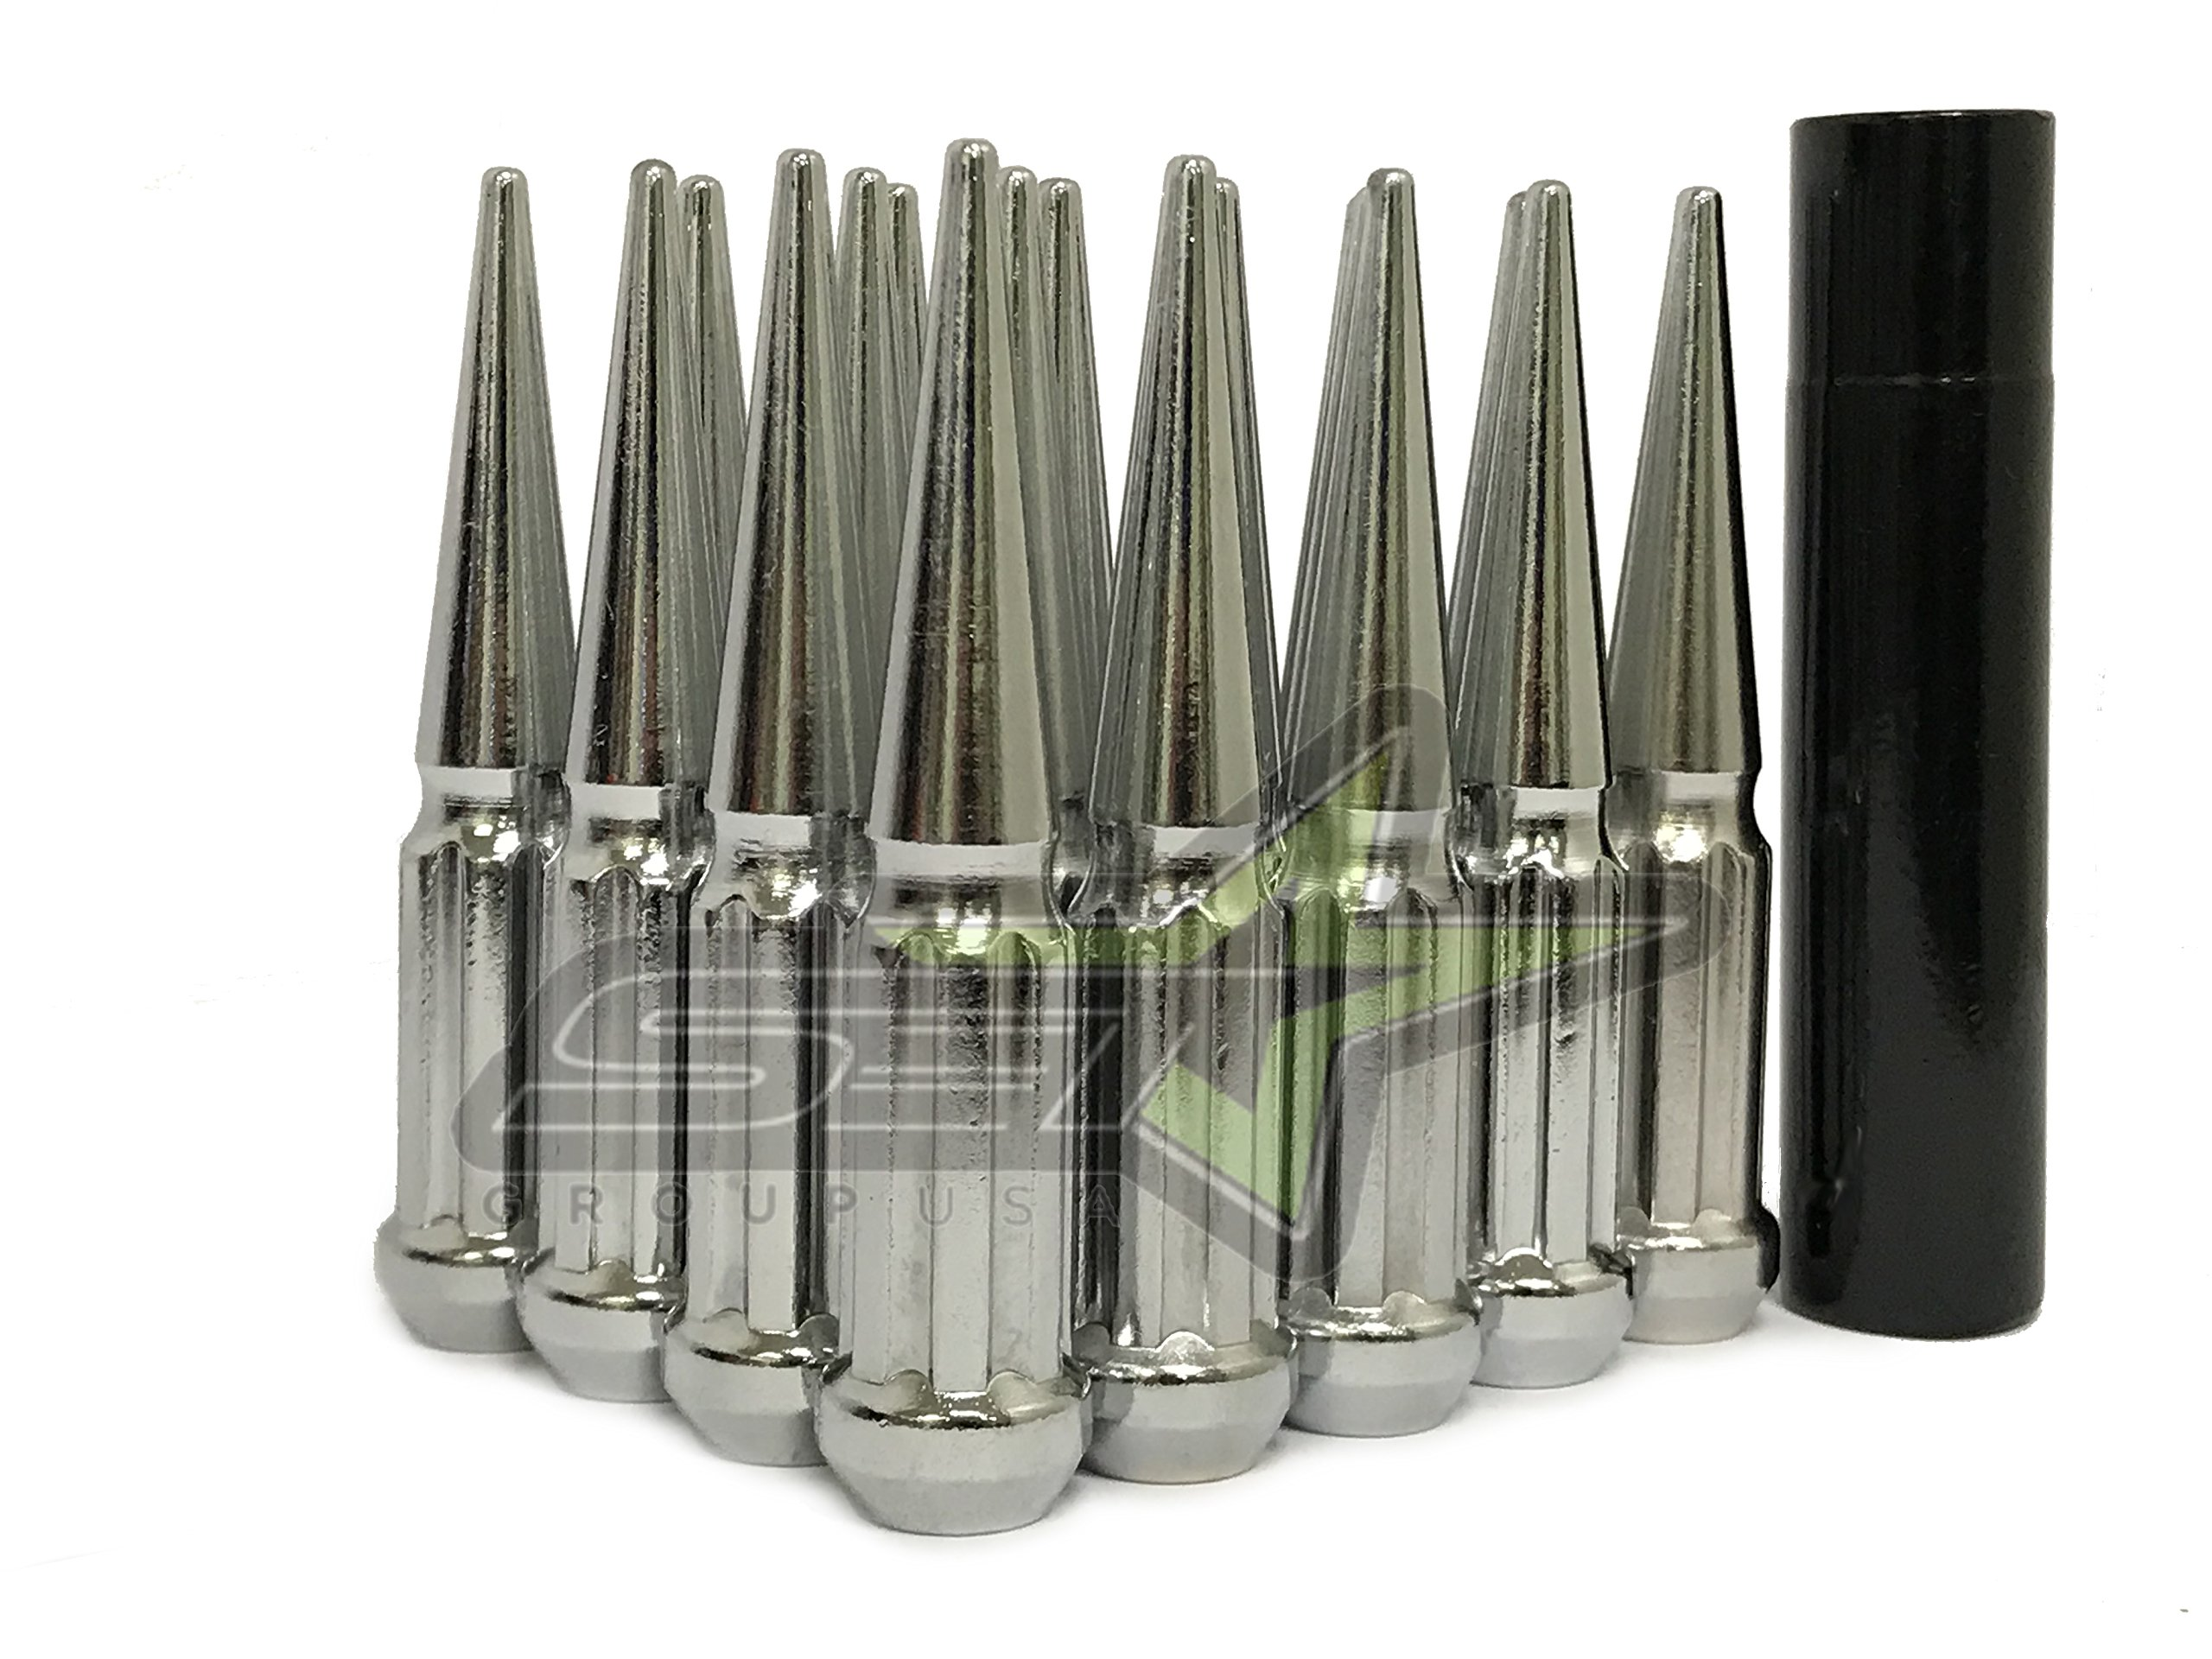 SET Group USA 20 Chrome Anti Theft Spline Spike Lug Nuts 12x1.5 Thread Pitch | Tall Spiked Locking Lug Nuts 4.5'' Tall